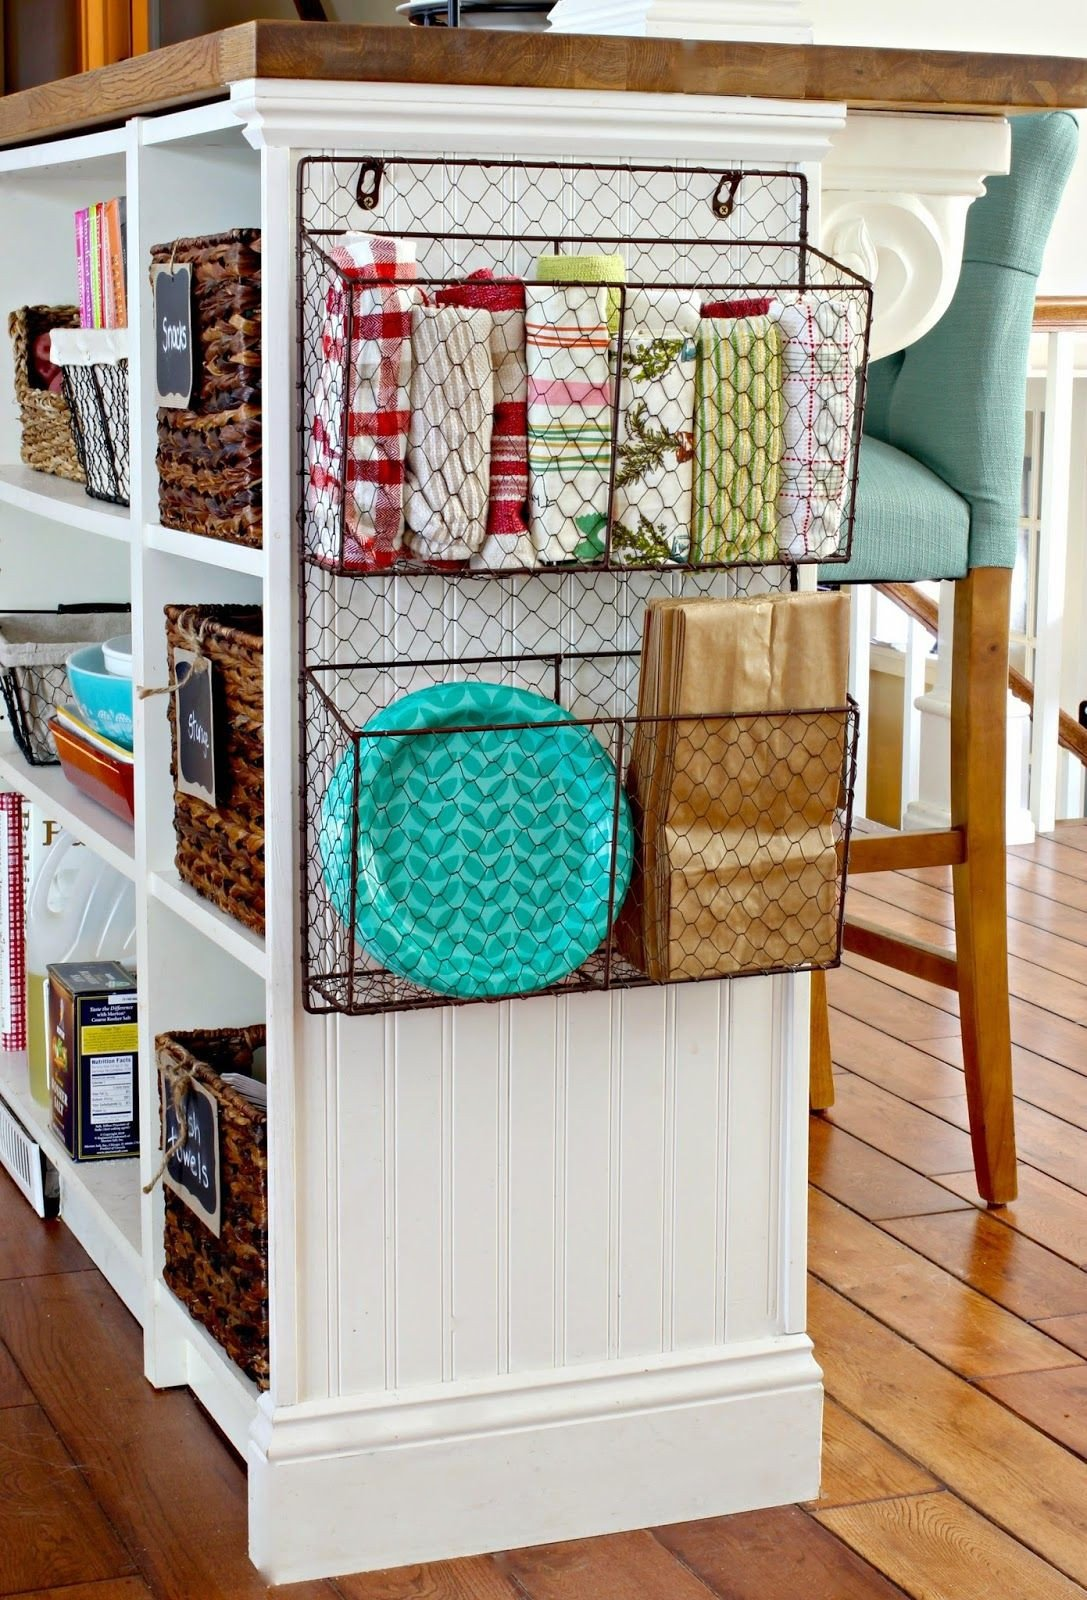 Kitchen Wall Decor Ideas Diy Elegant Diy Kitchen Decor On Pinterest